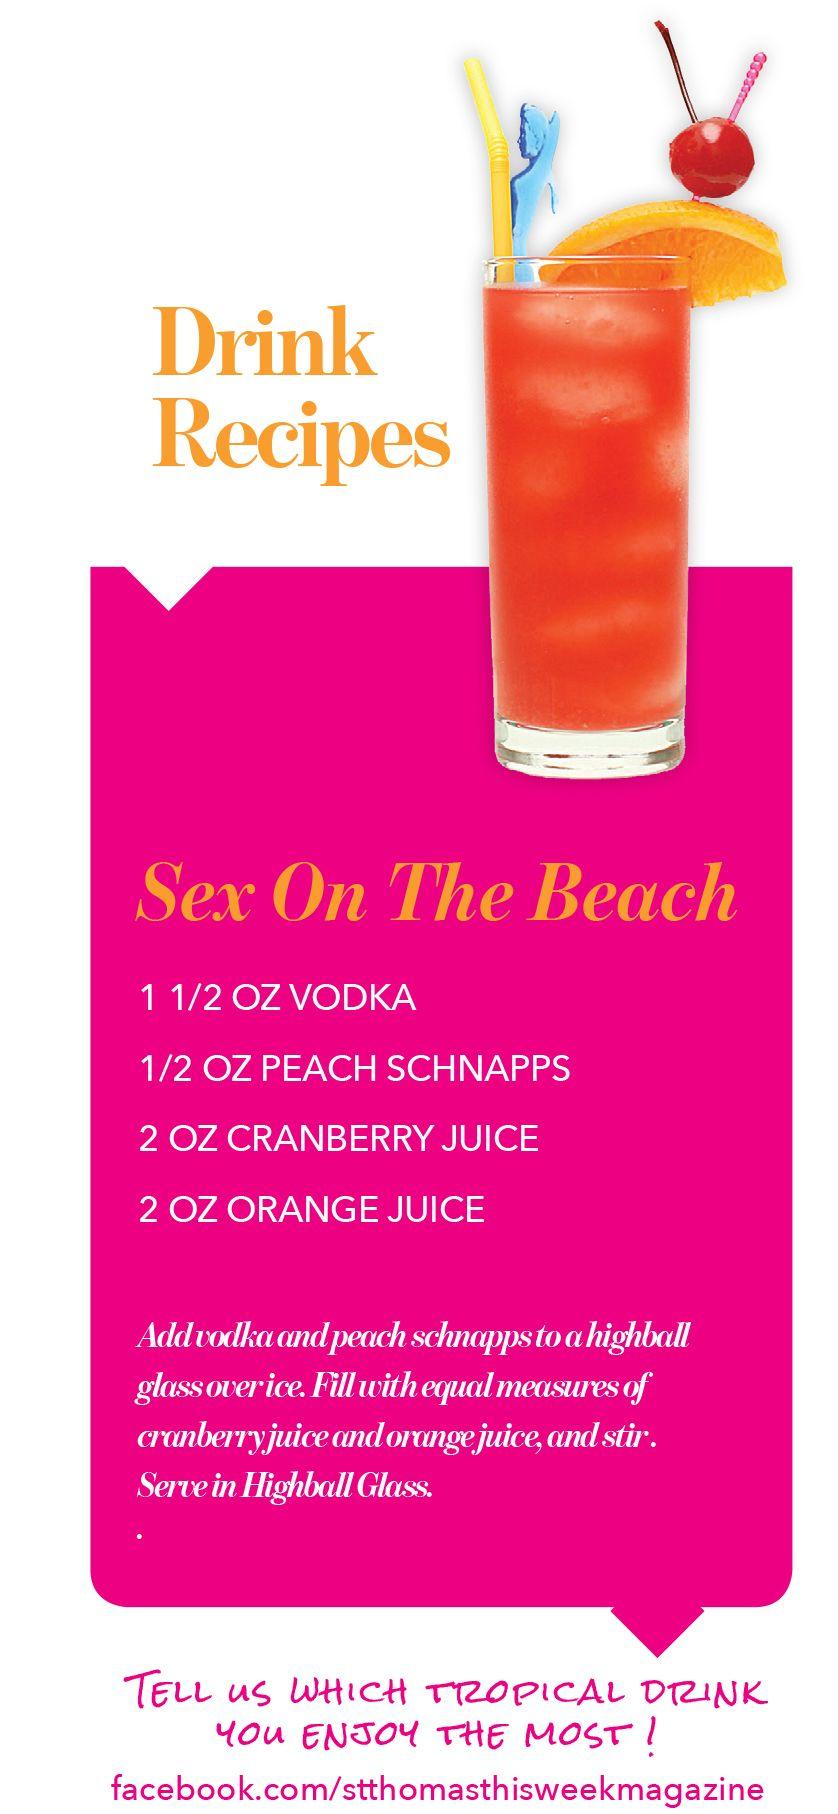 Visit www.virginislandsthisweek.com for more | Taste of the Tropics ...